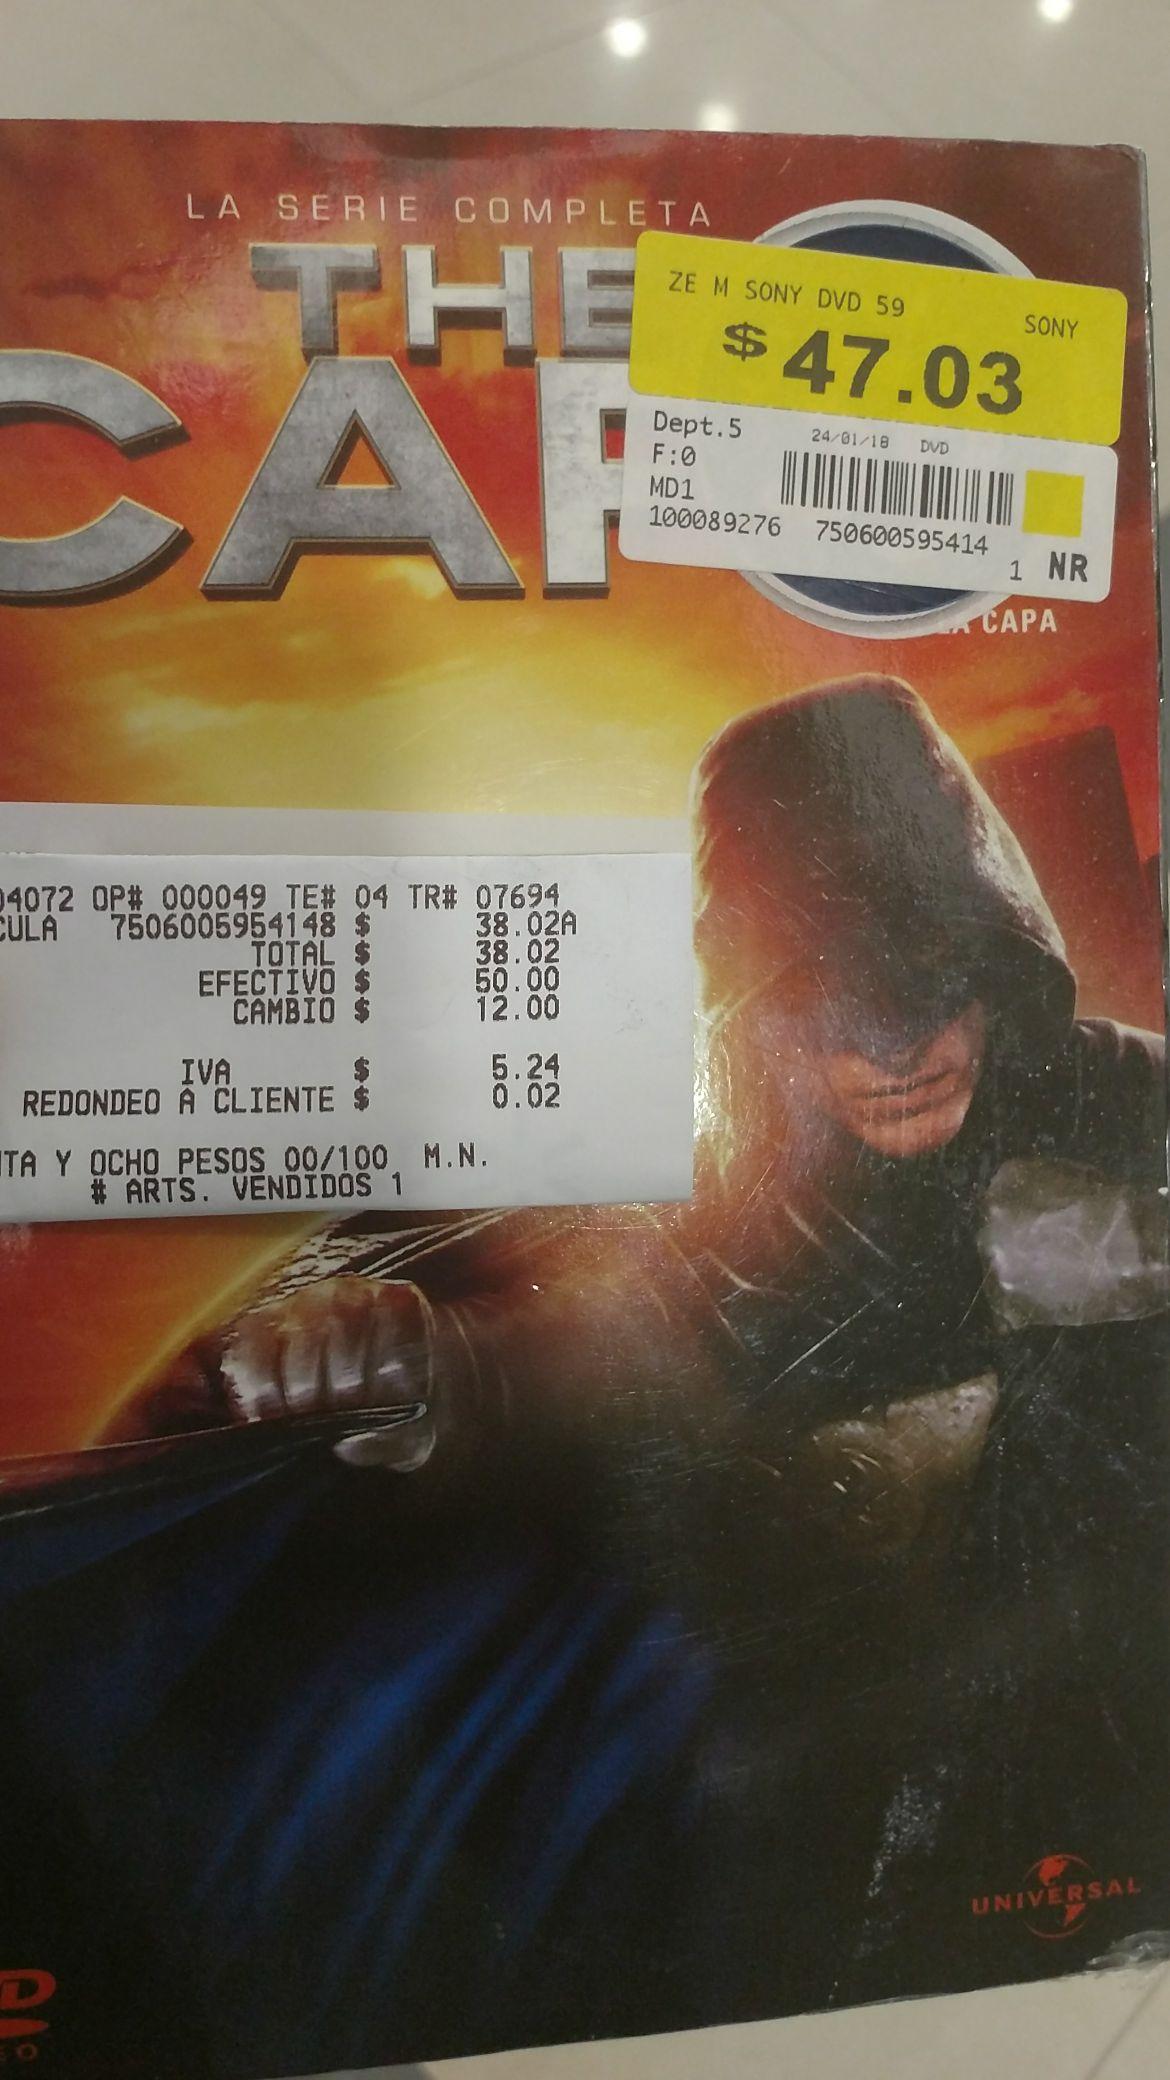 Walmart Tapachula: Serie la capa $38.02